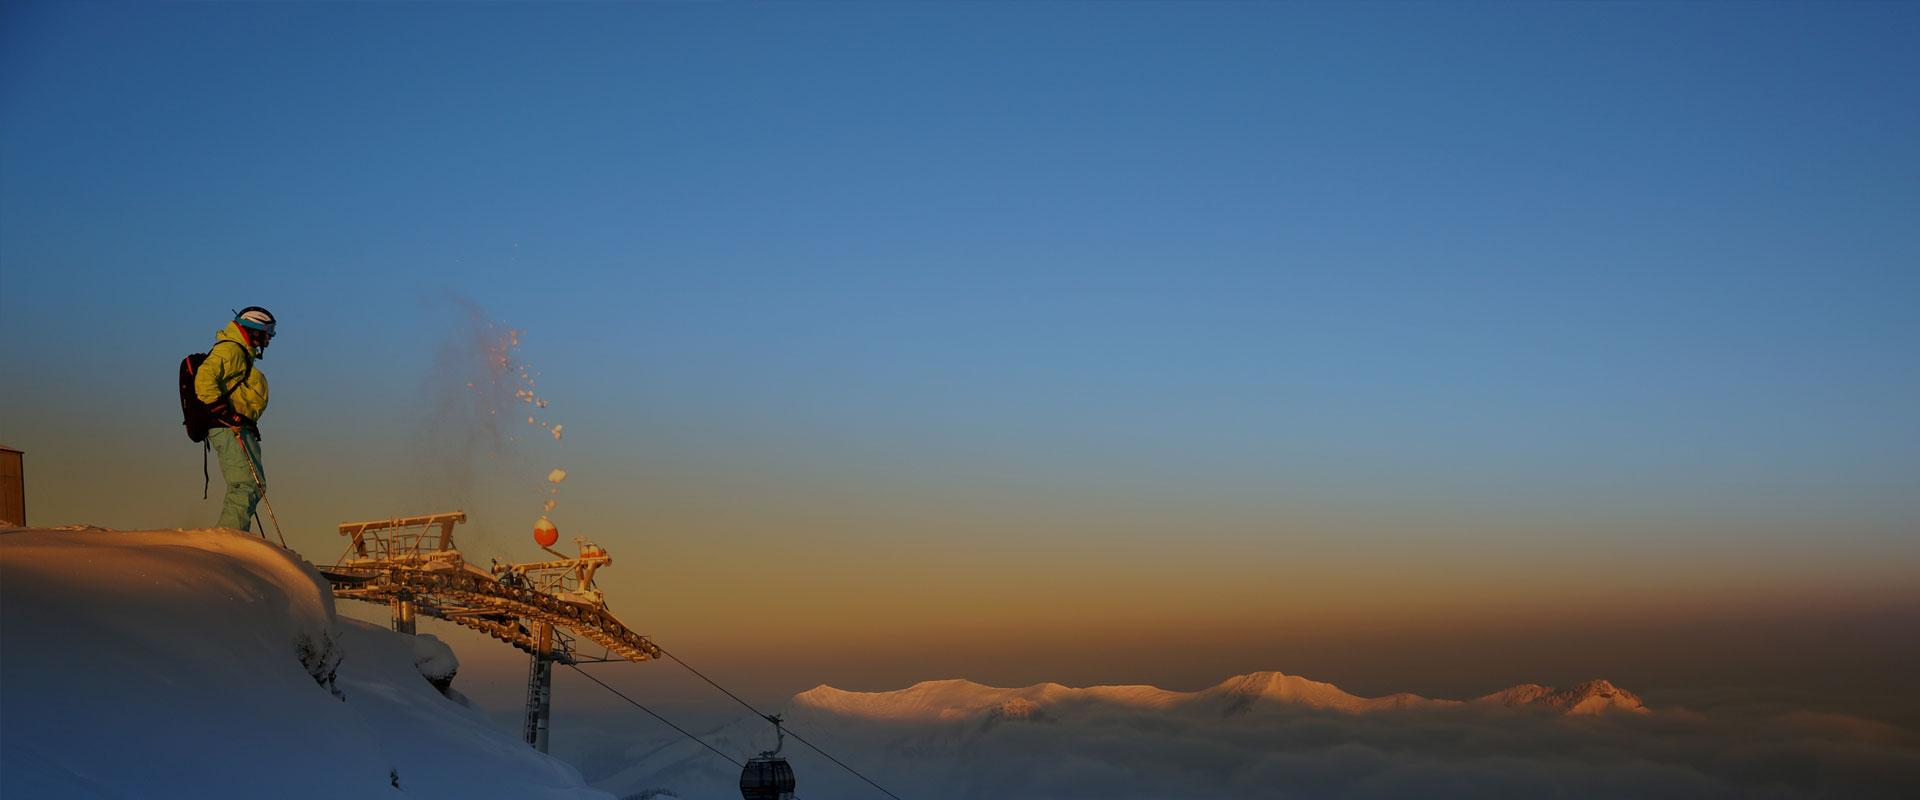 ski rental & ski school